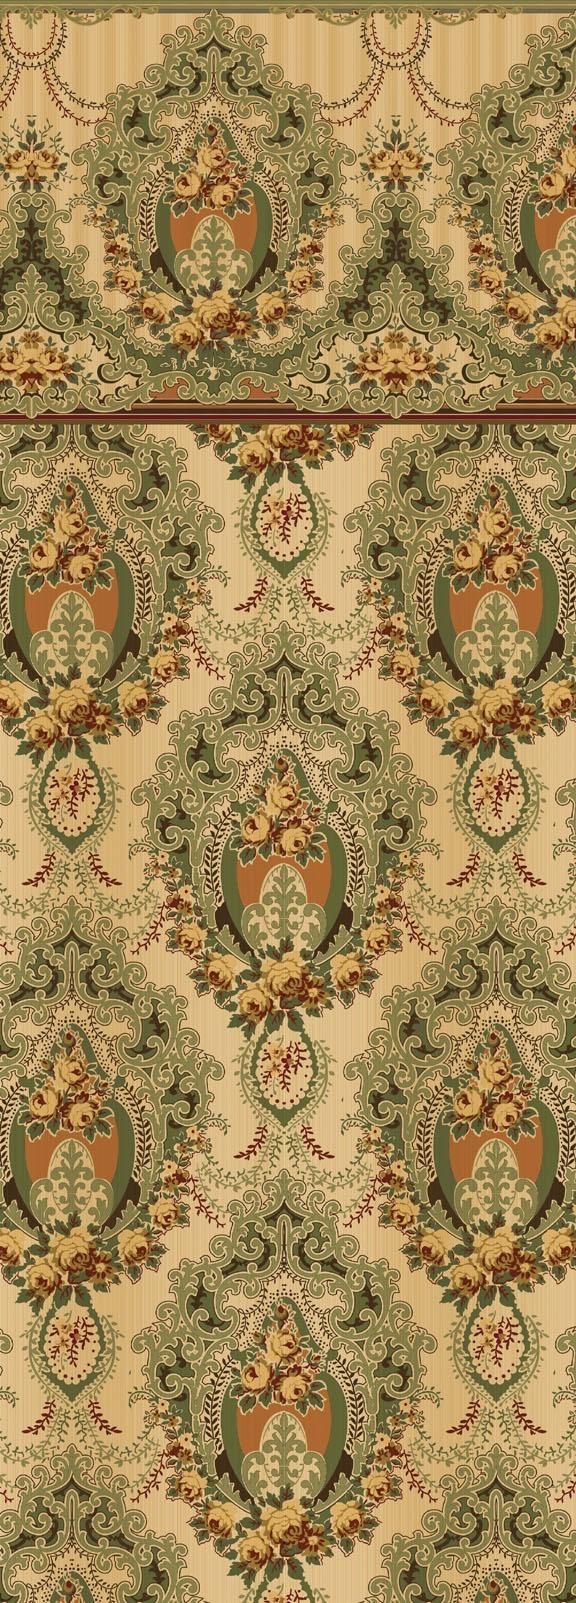 Best 25+ Victorian wallpaper ideas on Pinterest | Bedroom wallpaper victorian, Art nouveau ...